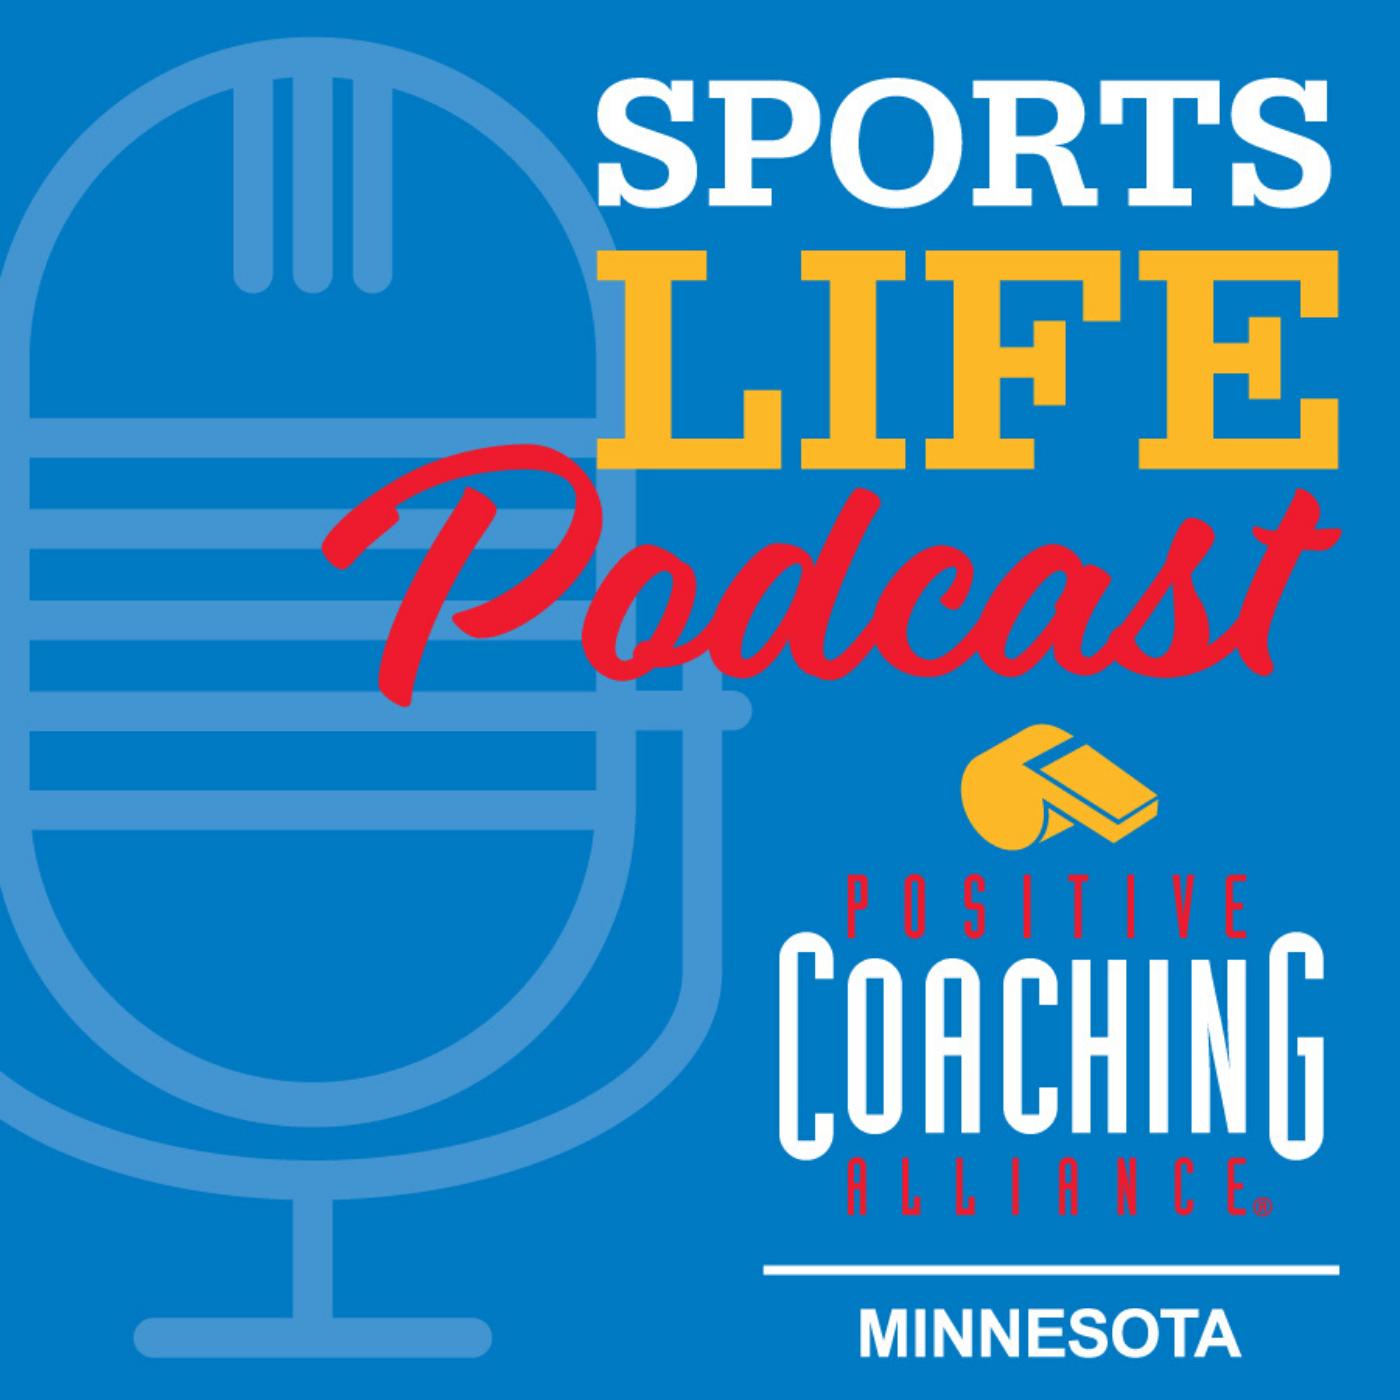 Ep 17: How John Millea Of the Minnesota High School Sports League Got Over 200 Schools Across Minnesota to Be the Light #BetheLightMN the Night